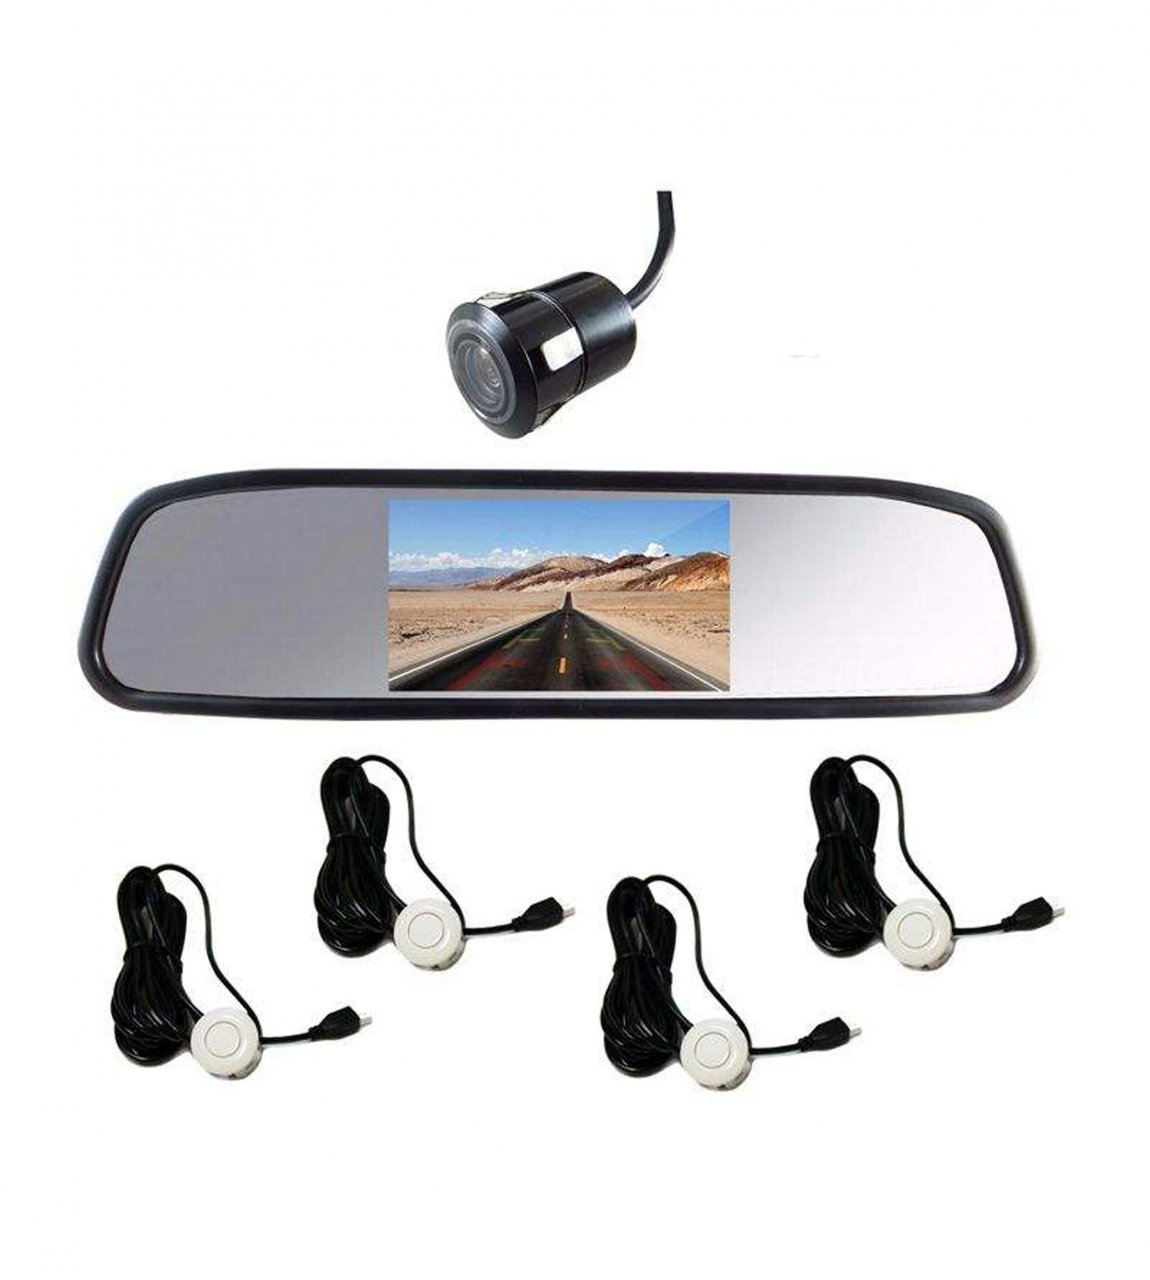 آینه مانیتوردار و دوربین دنده عقب کلارو مدل CL-409S